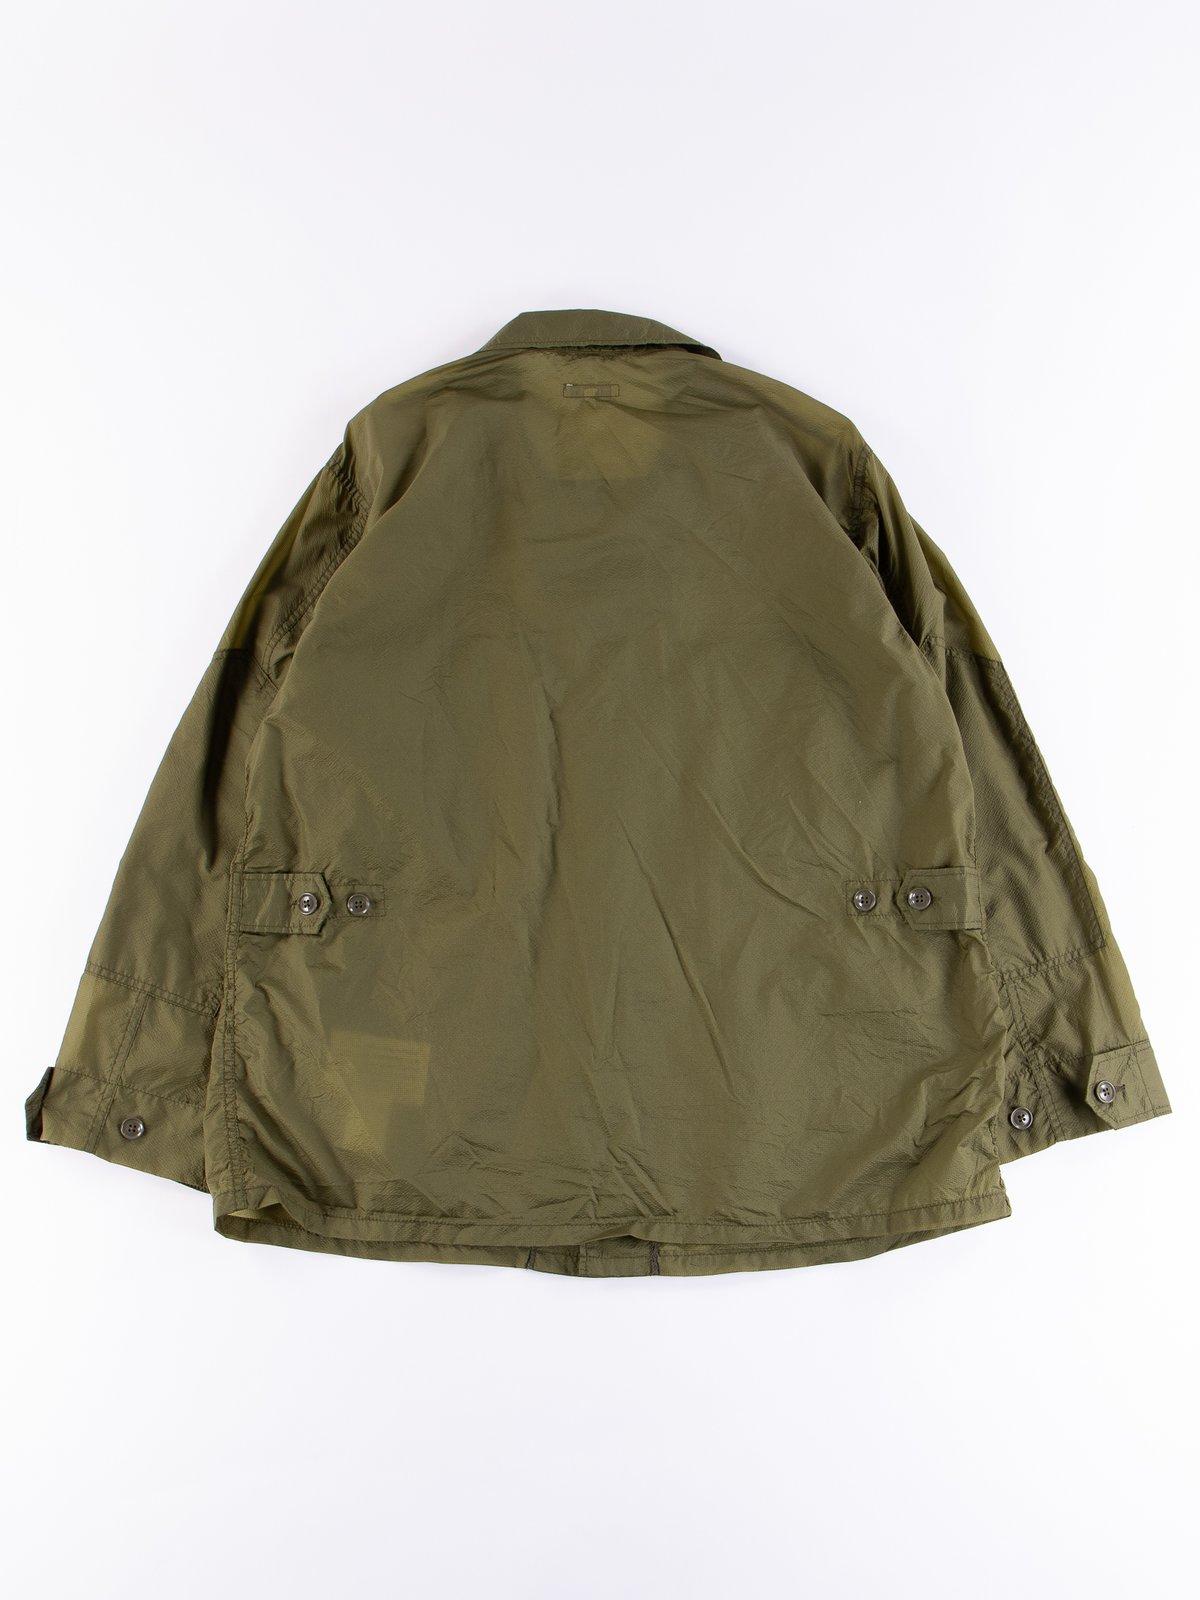 Olive Nylon Micro Ripstop BDU Jacket - Image 5